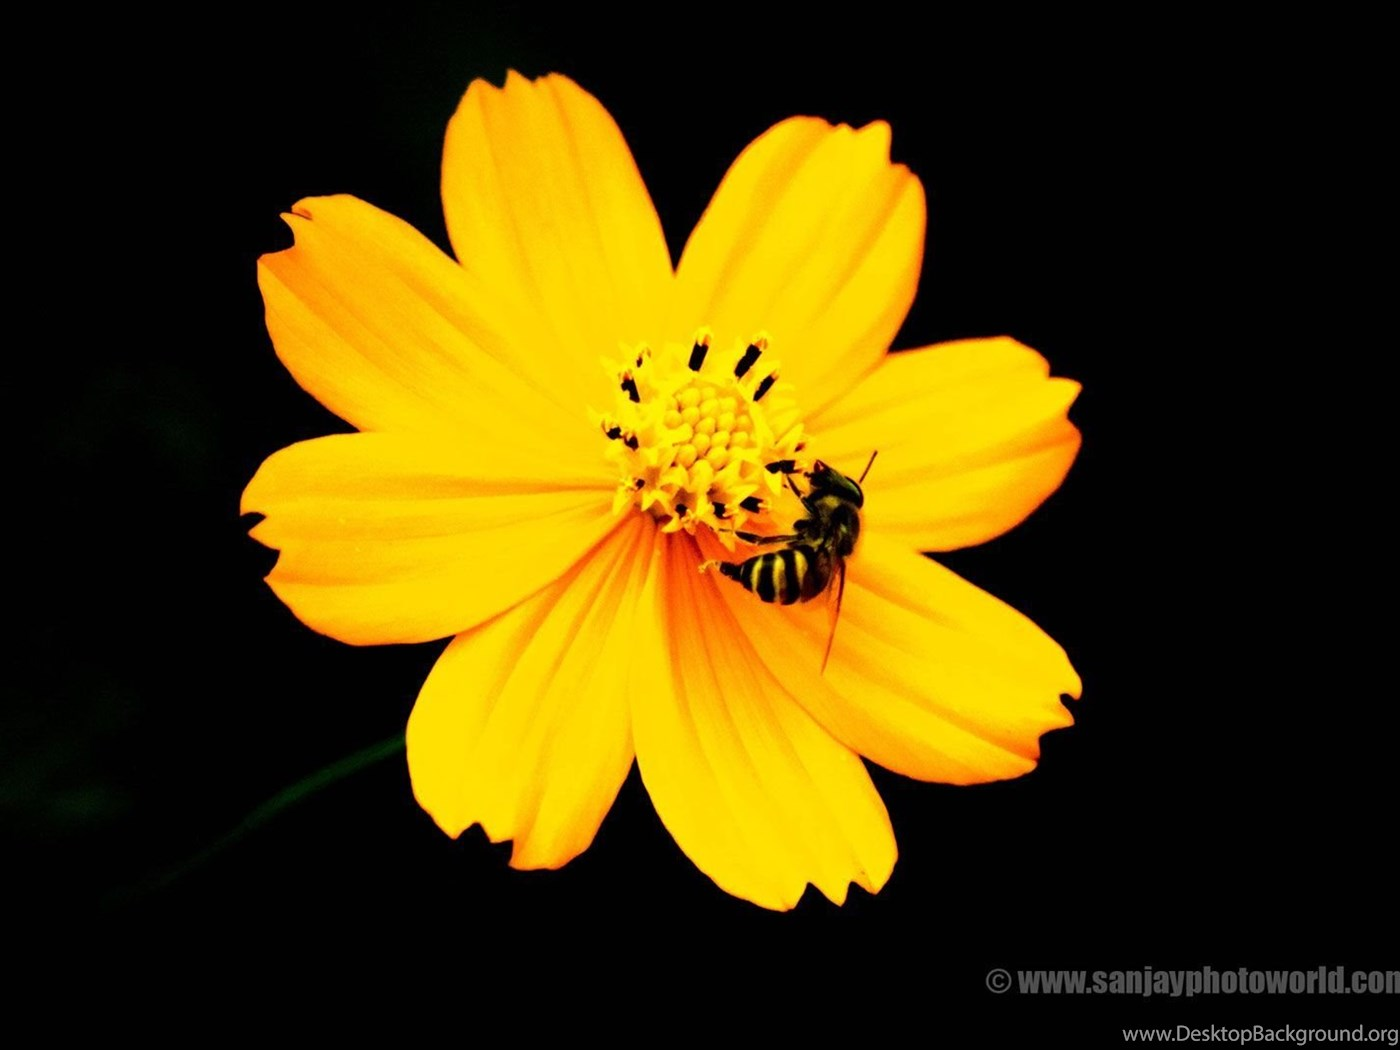 Sanjay Photo World Hd Beautiful Flowers Wallpapers Vol 04 Desktop